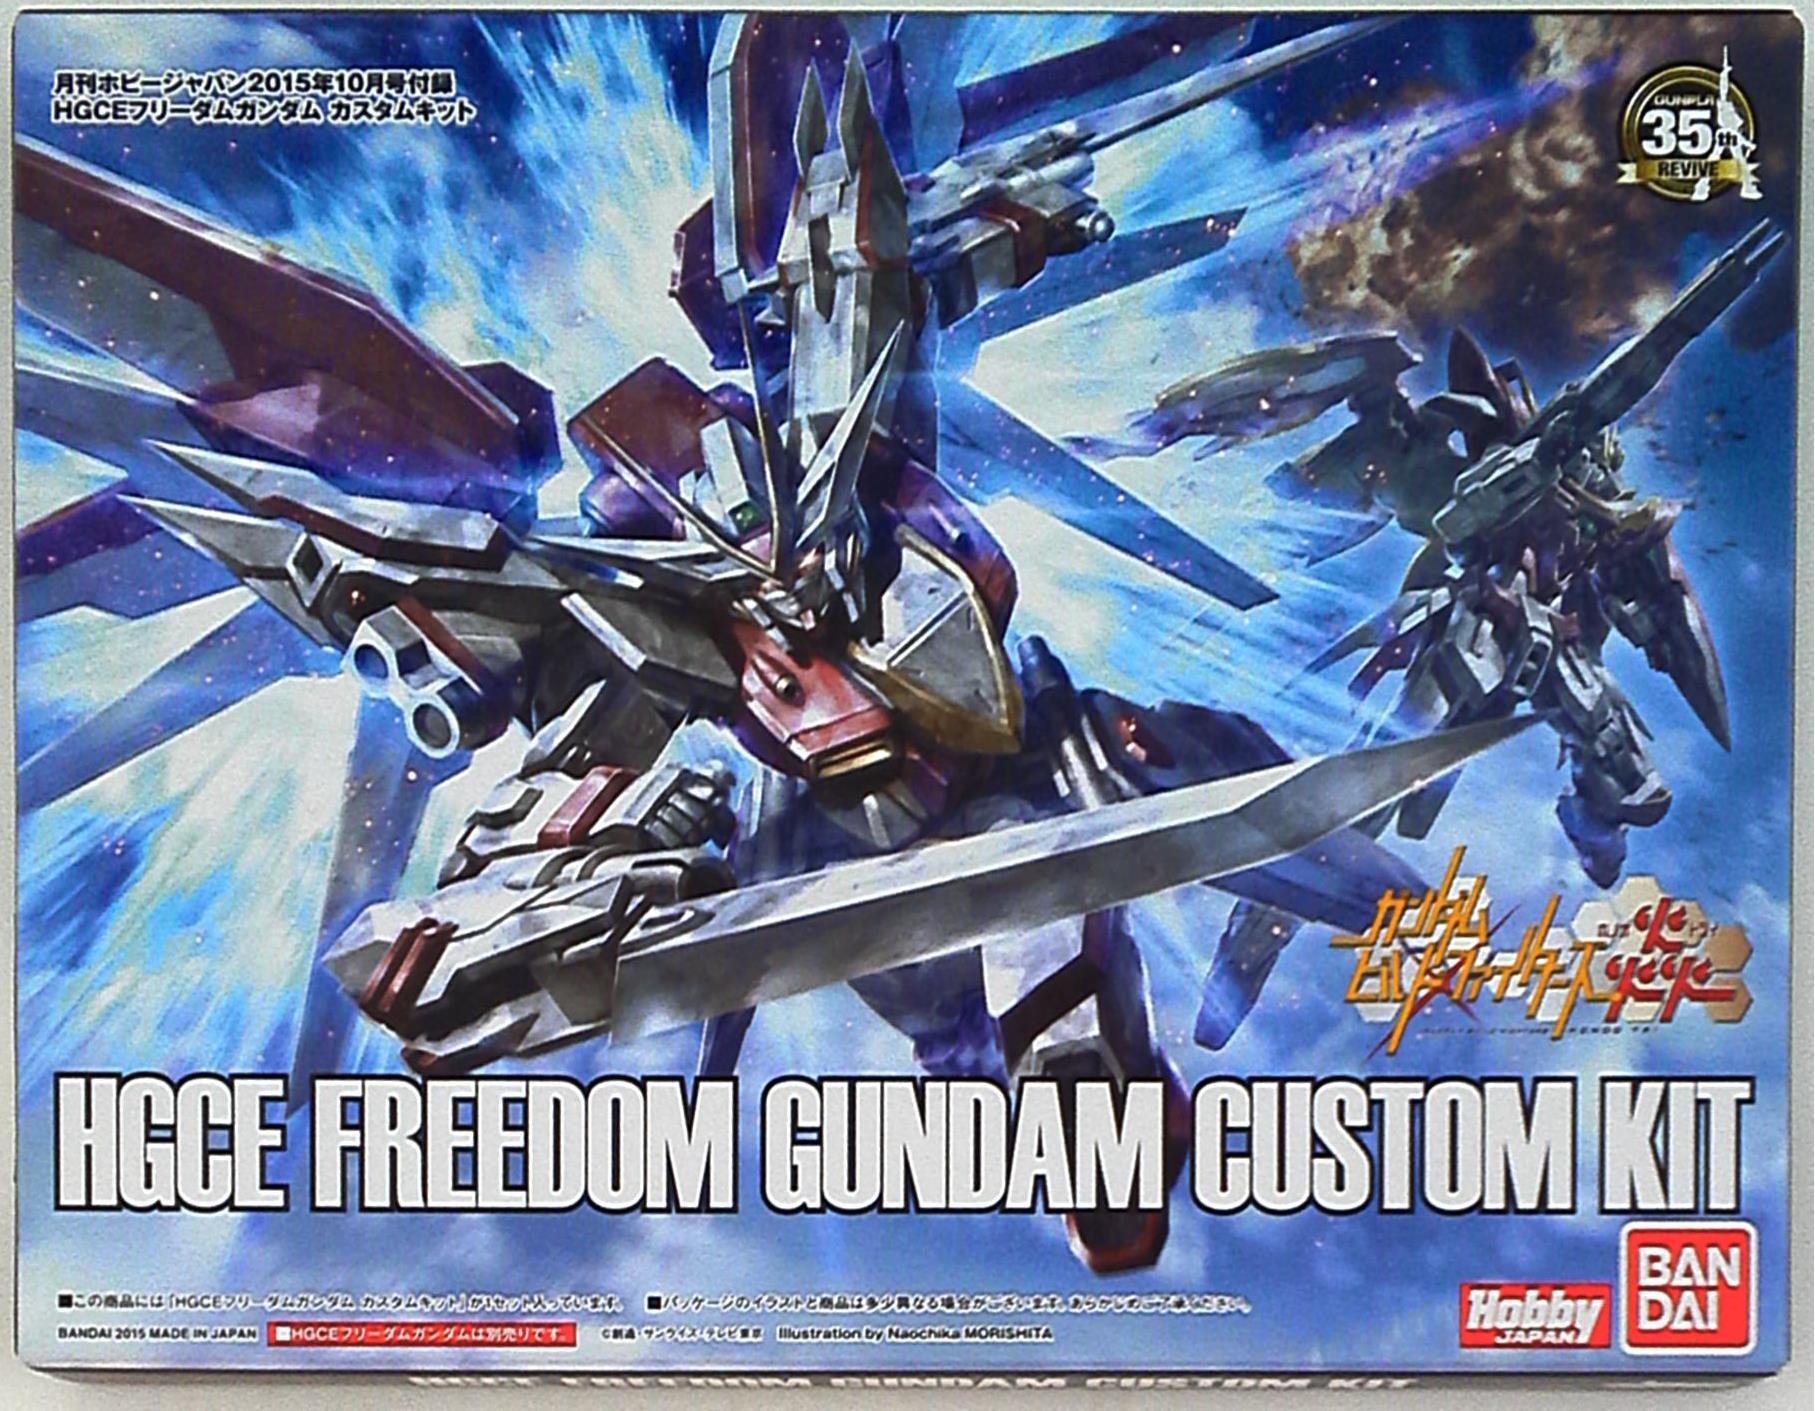 BANDAI GUNDAM SEED HGCE freedom GUNDAM Custom-made kits 1/144